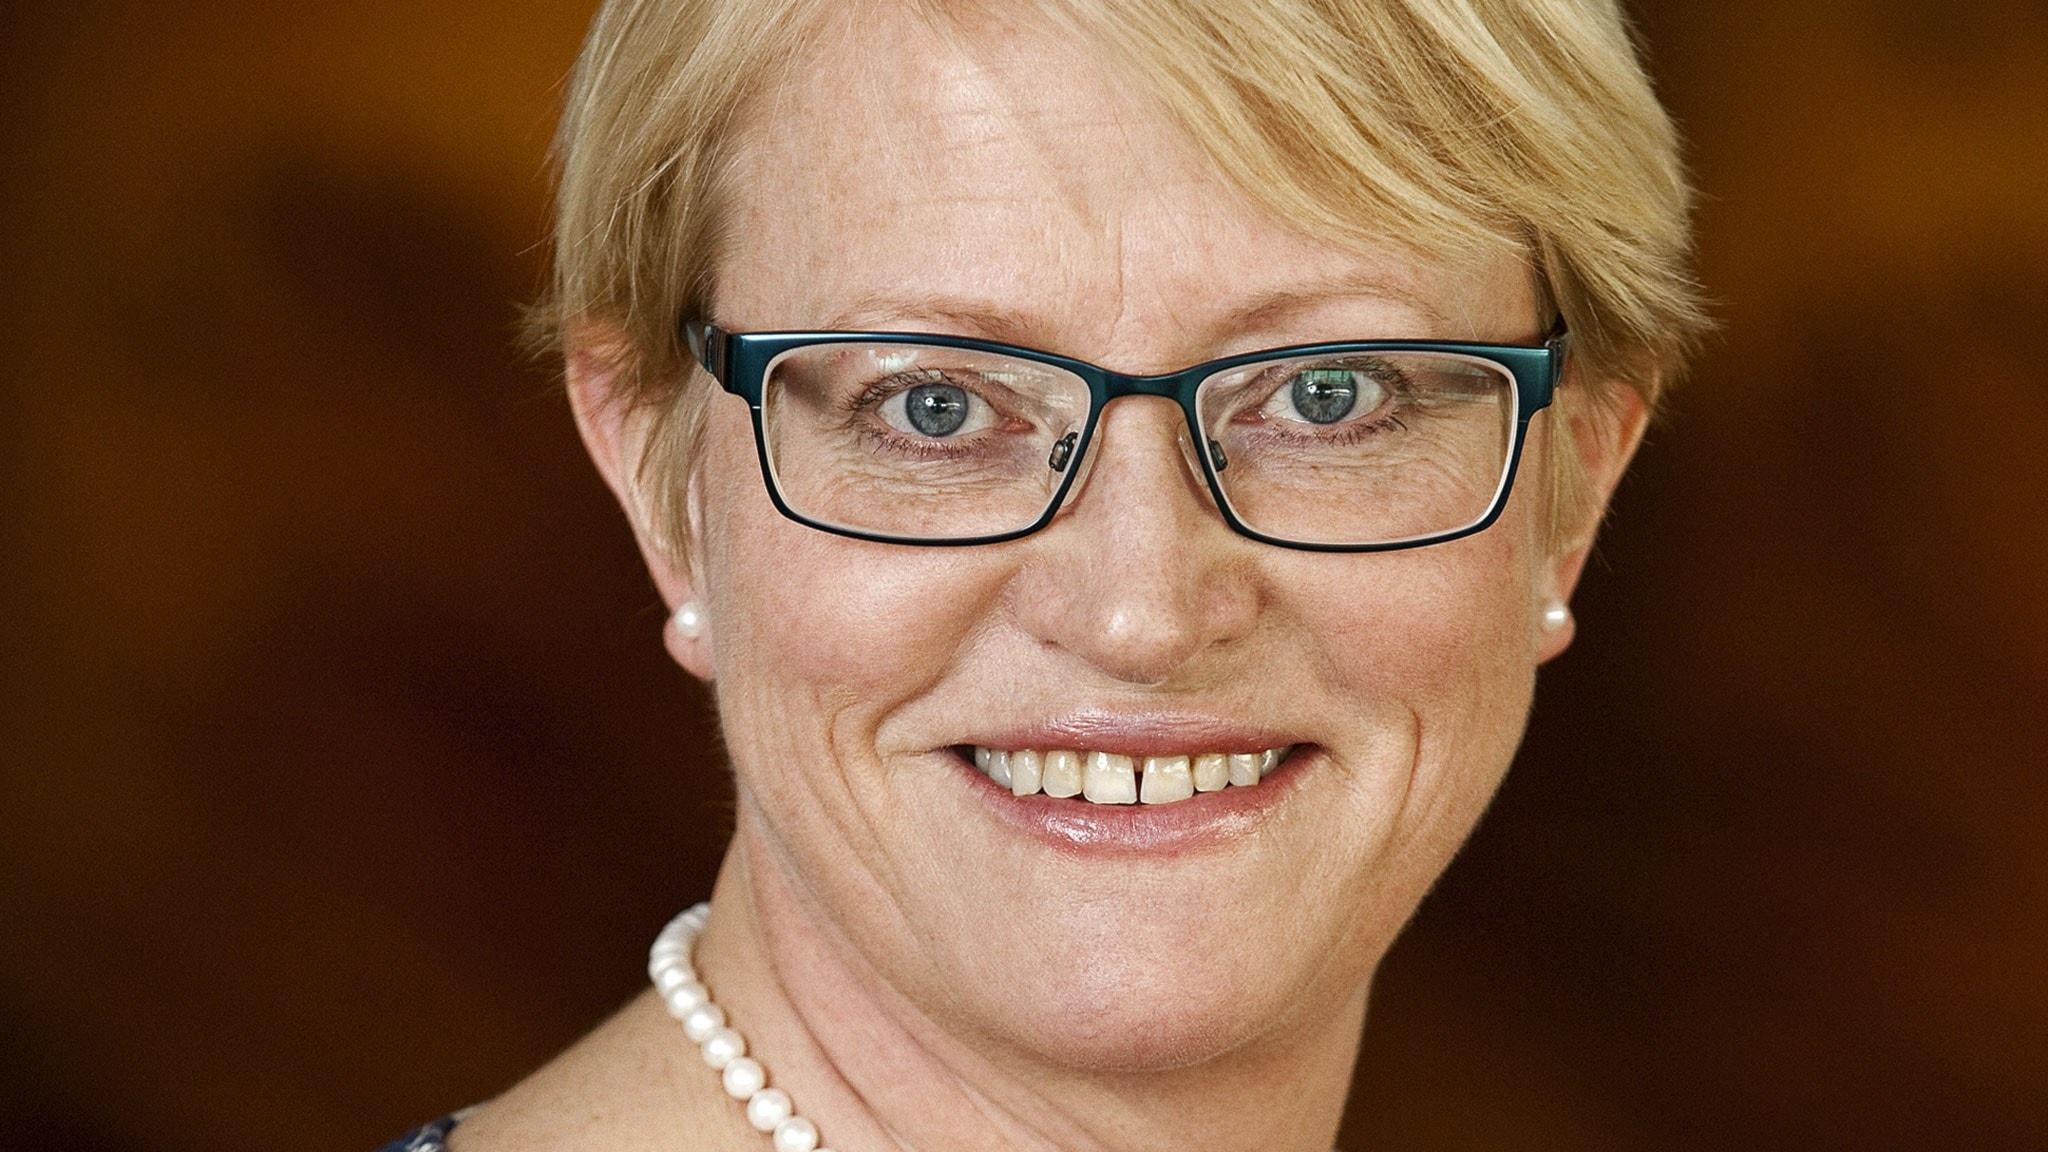 Ing-Marie Wieselgren